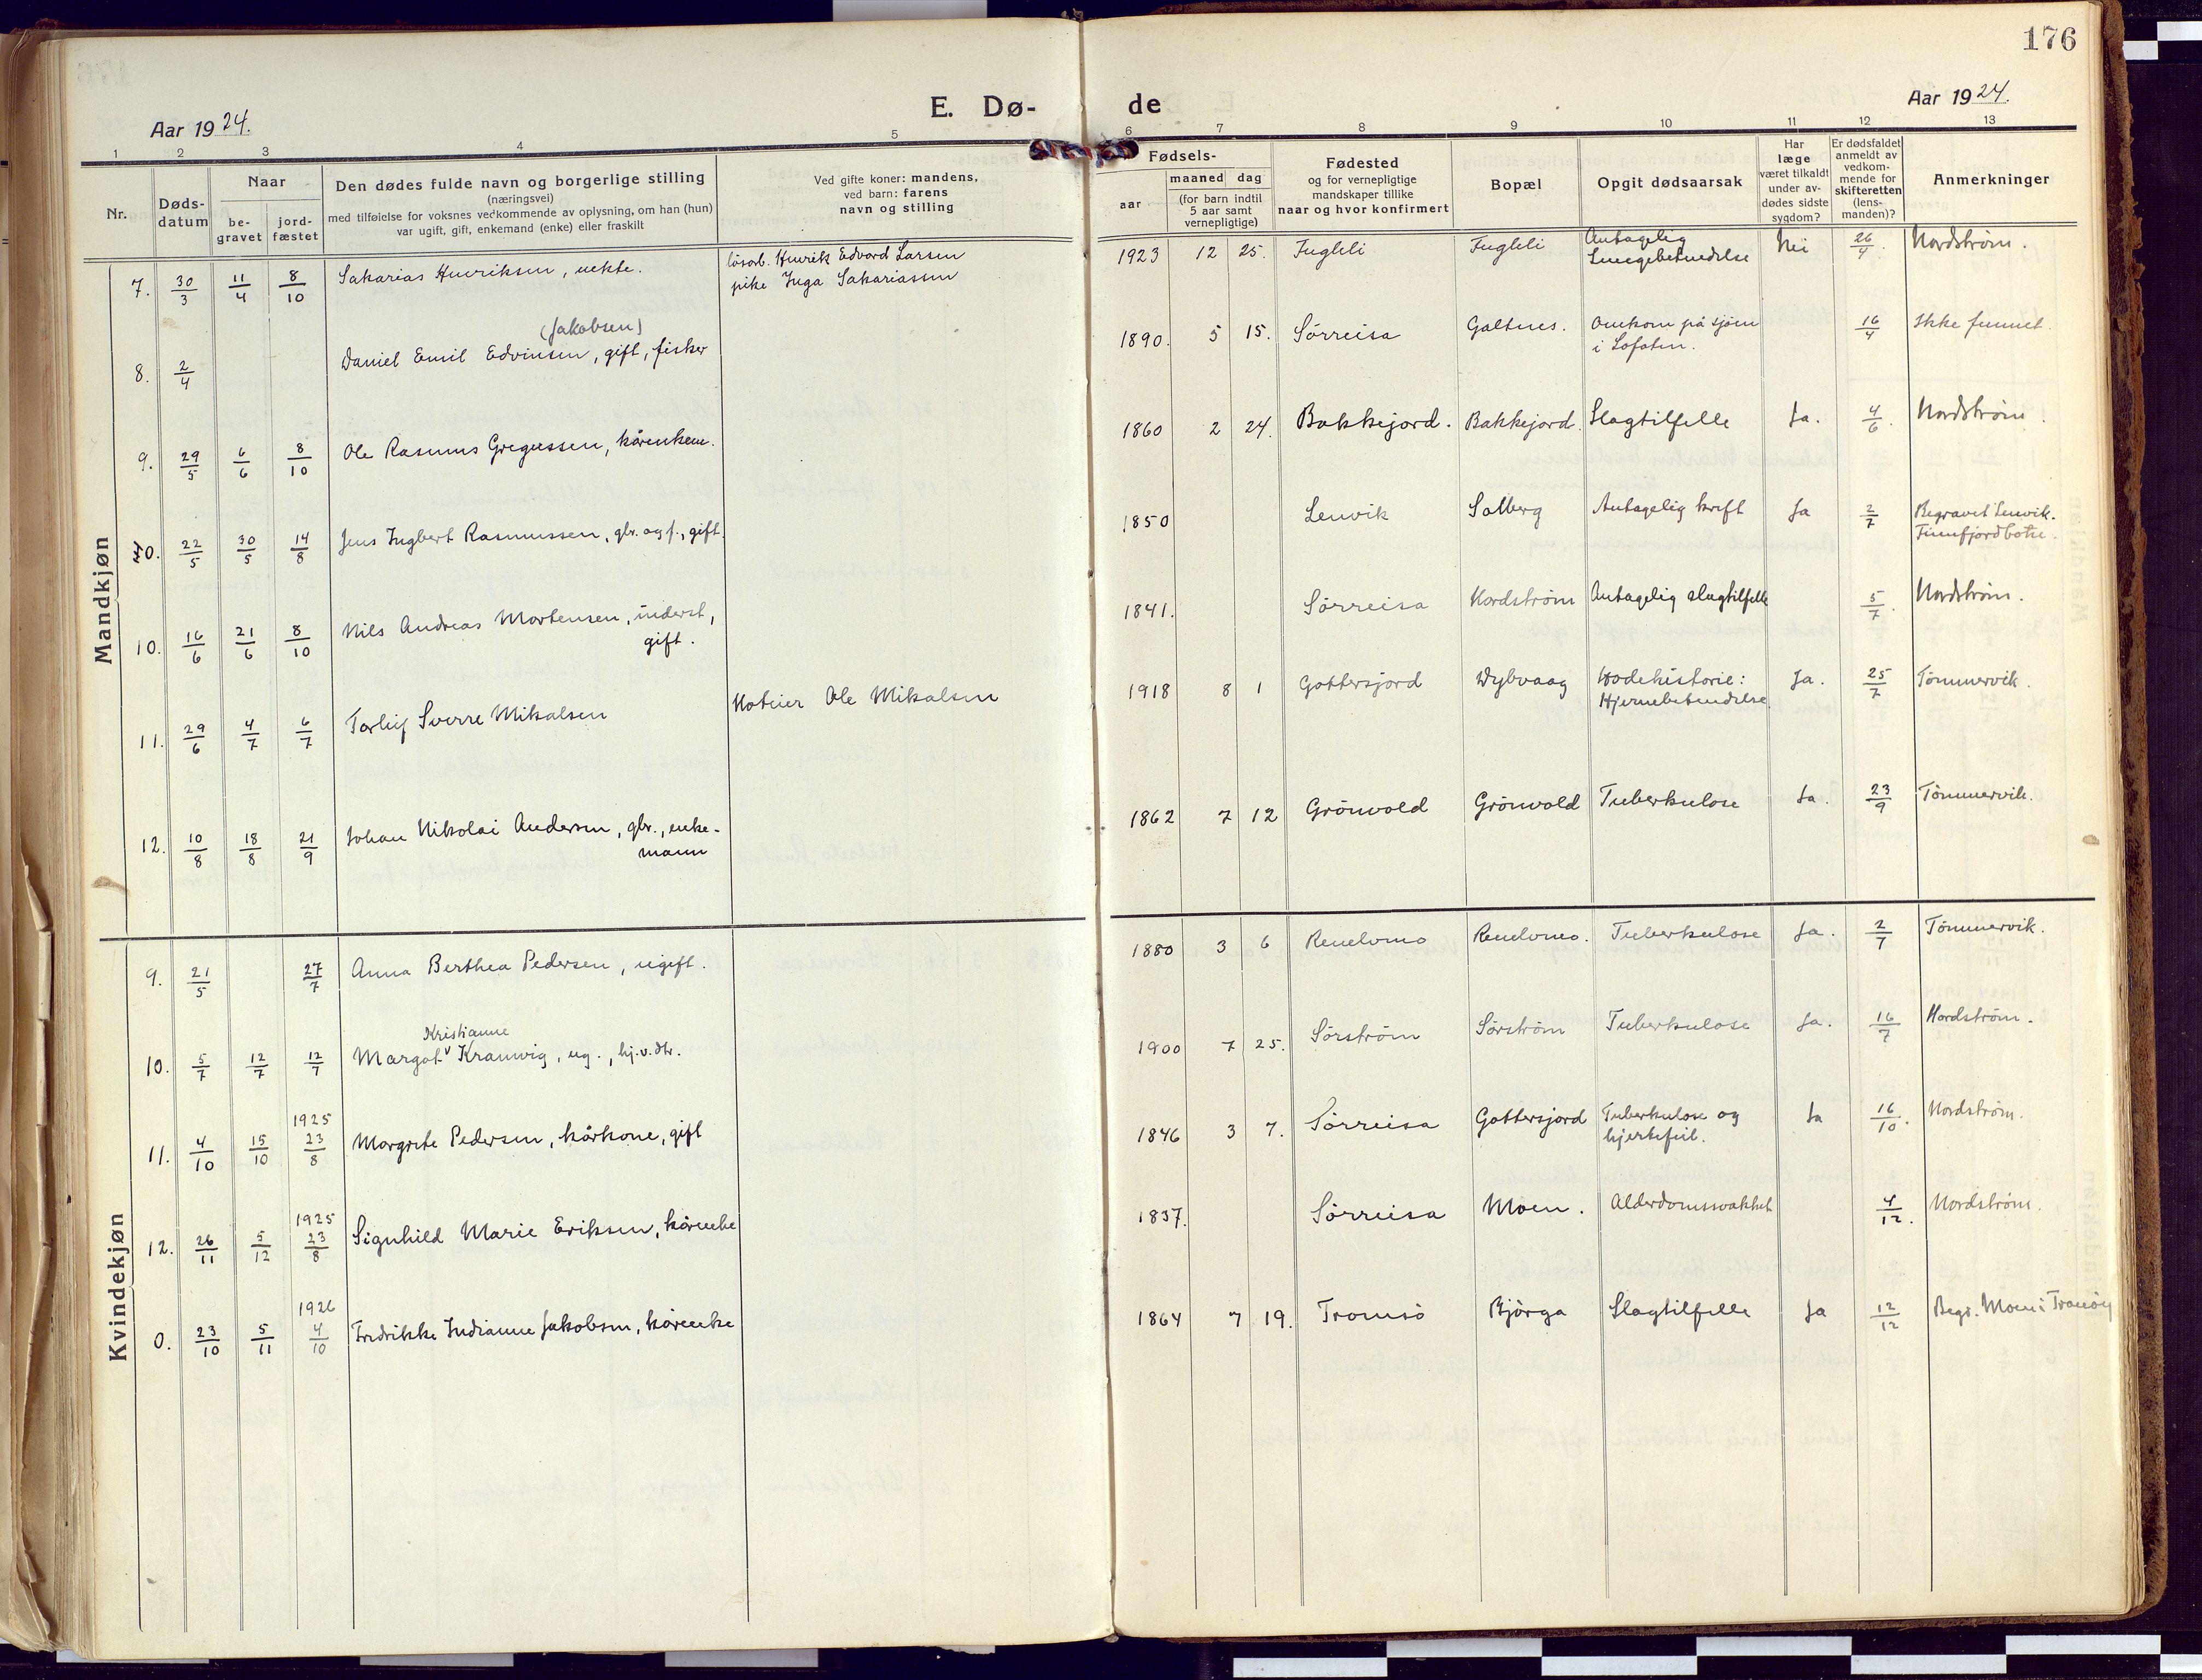 SATØ, Tranøy sokneprestkontor, I/Ia/Iaa/L0015kirke: Ministerialbok nr. 15, 1919-1928, s. 176